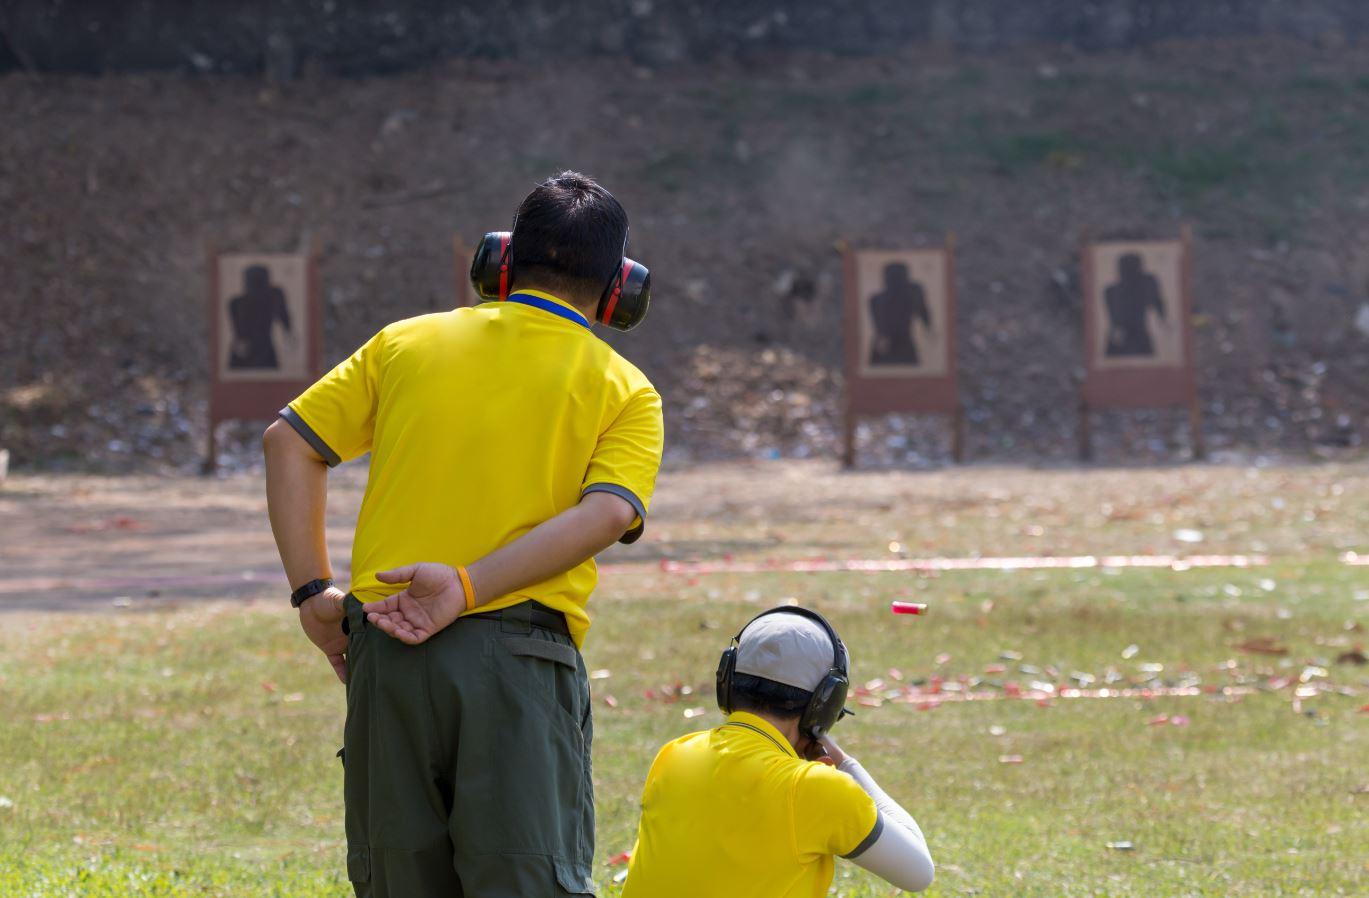 Guy shooting target practice